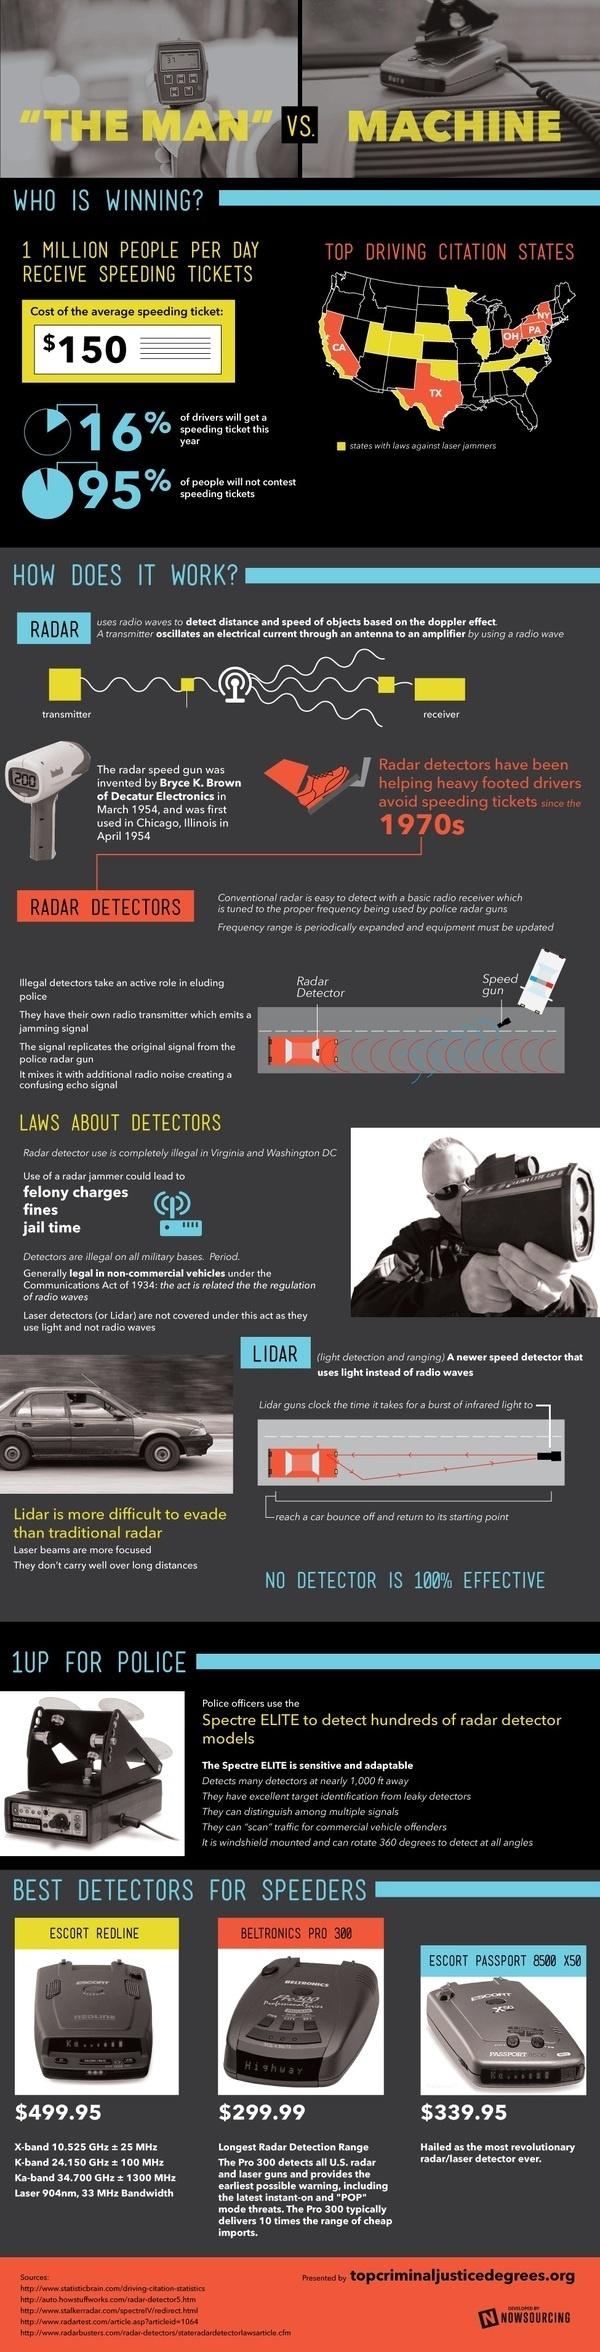 The Man vs. Machine: Who is Winning? #speeding #police #driving #cars #radar